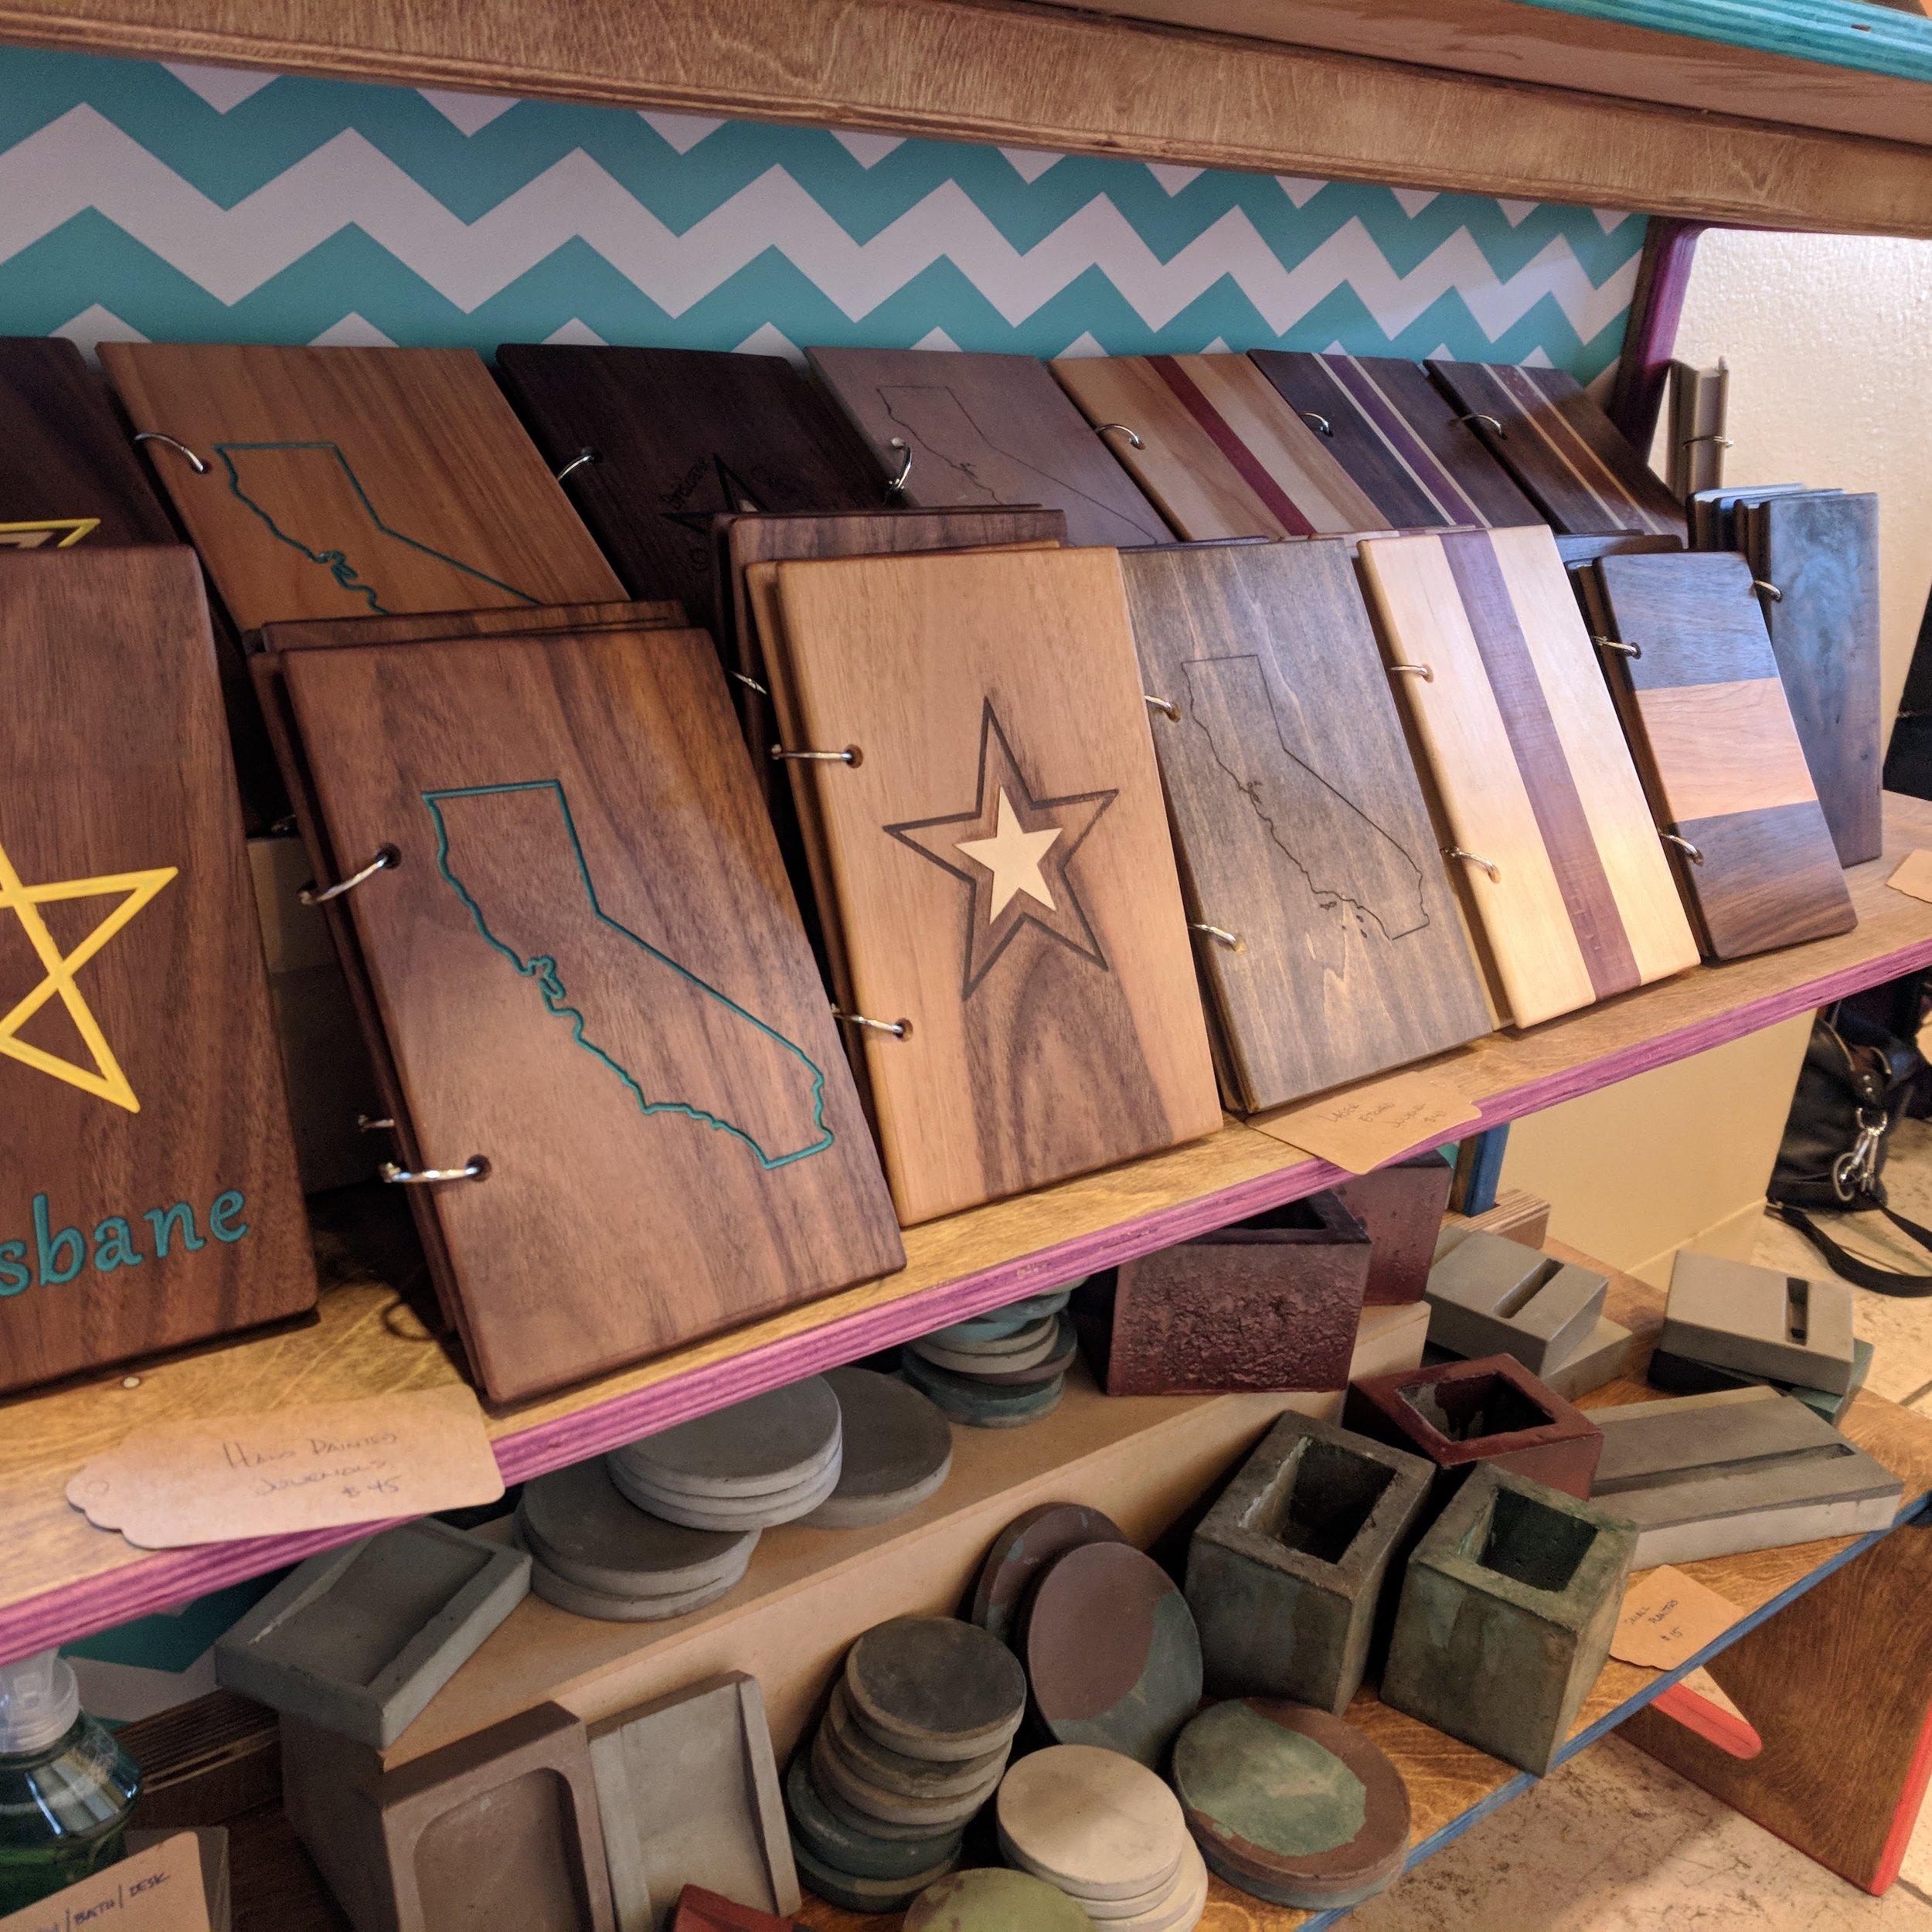 Wood Journals - Refillable wood journals.